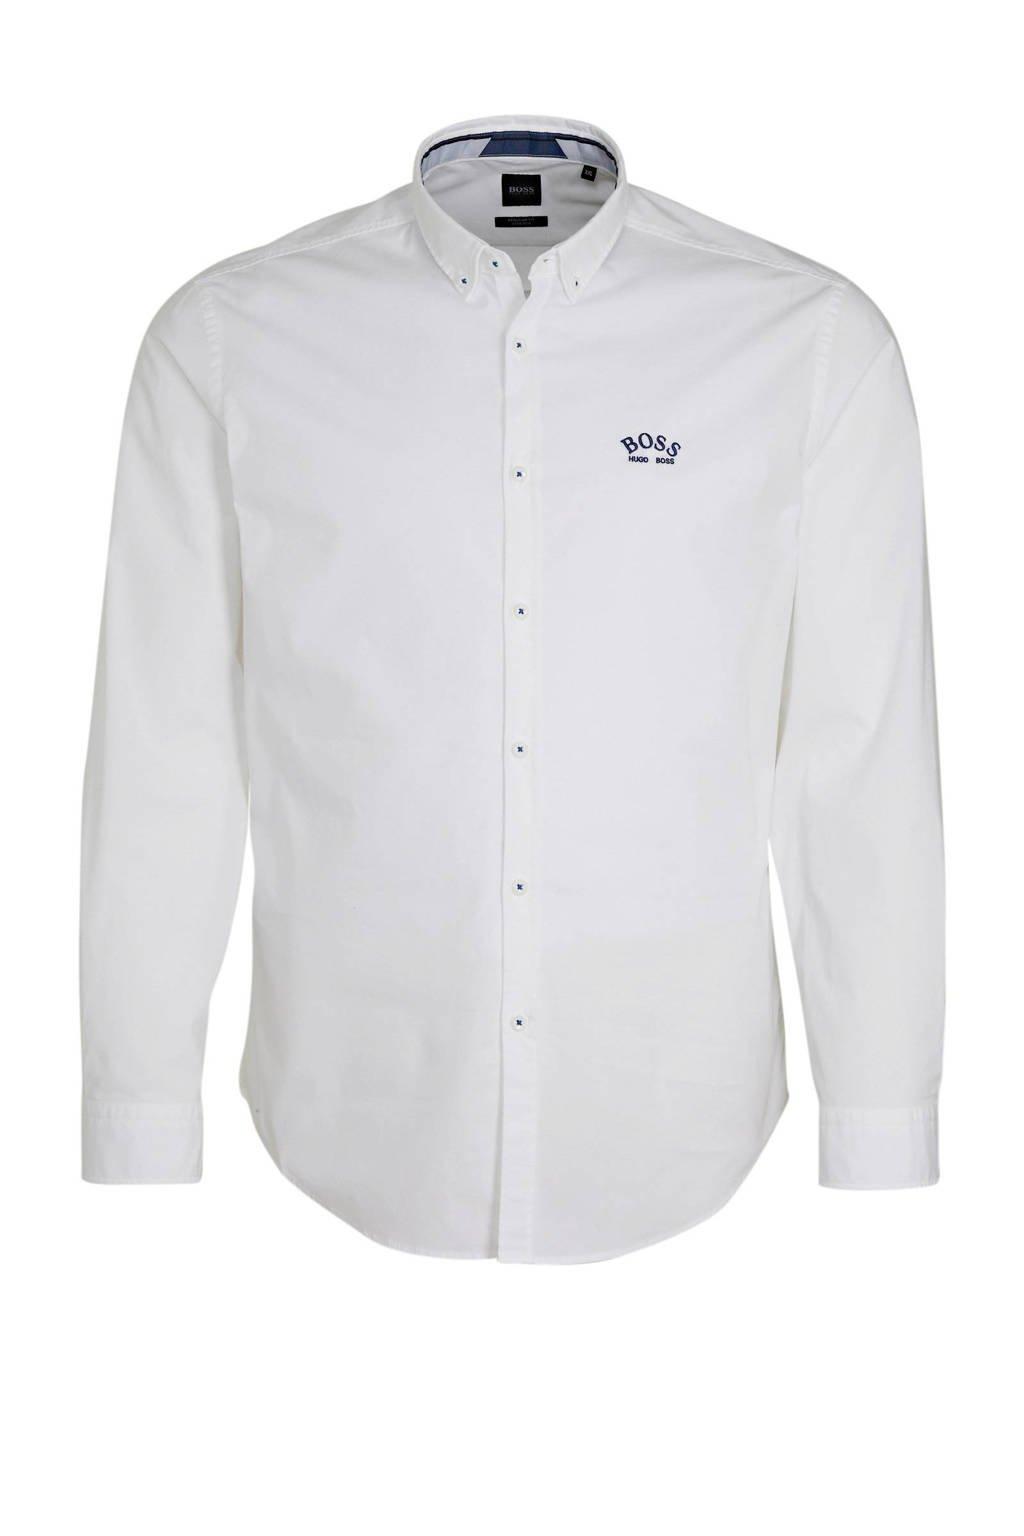 BOSS Athleisure Big & Tall regular fit overhemd wit, Wit